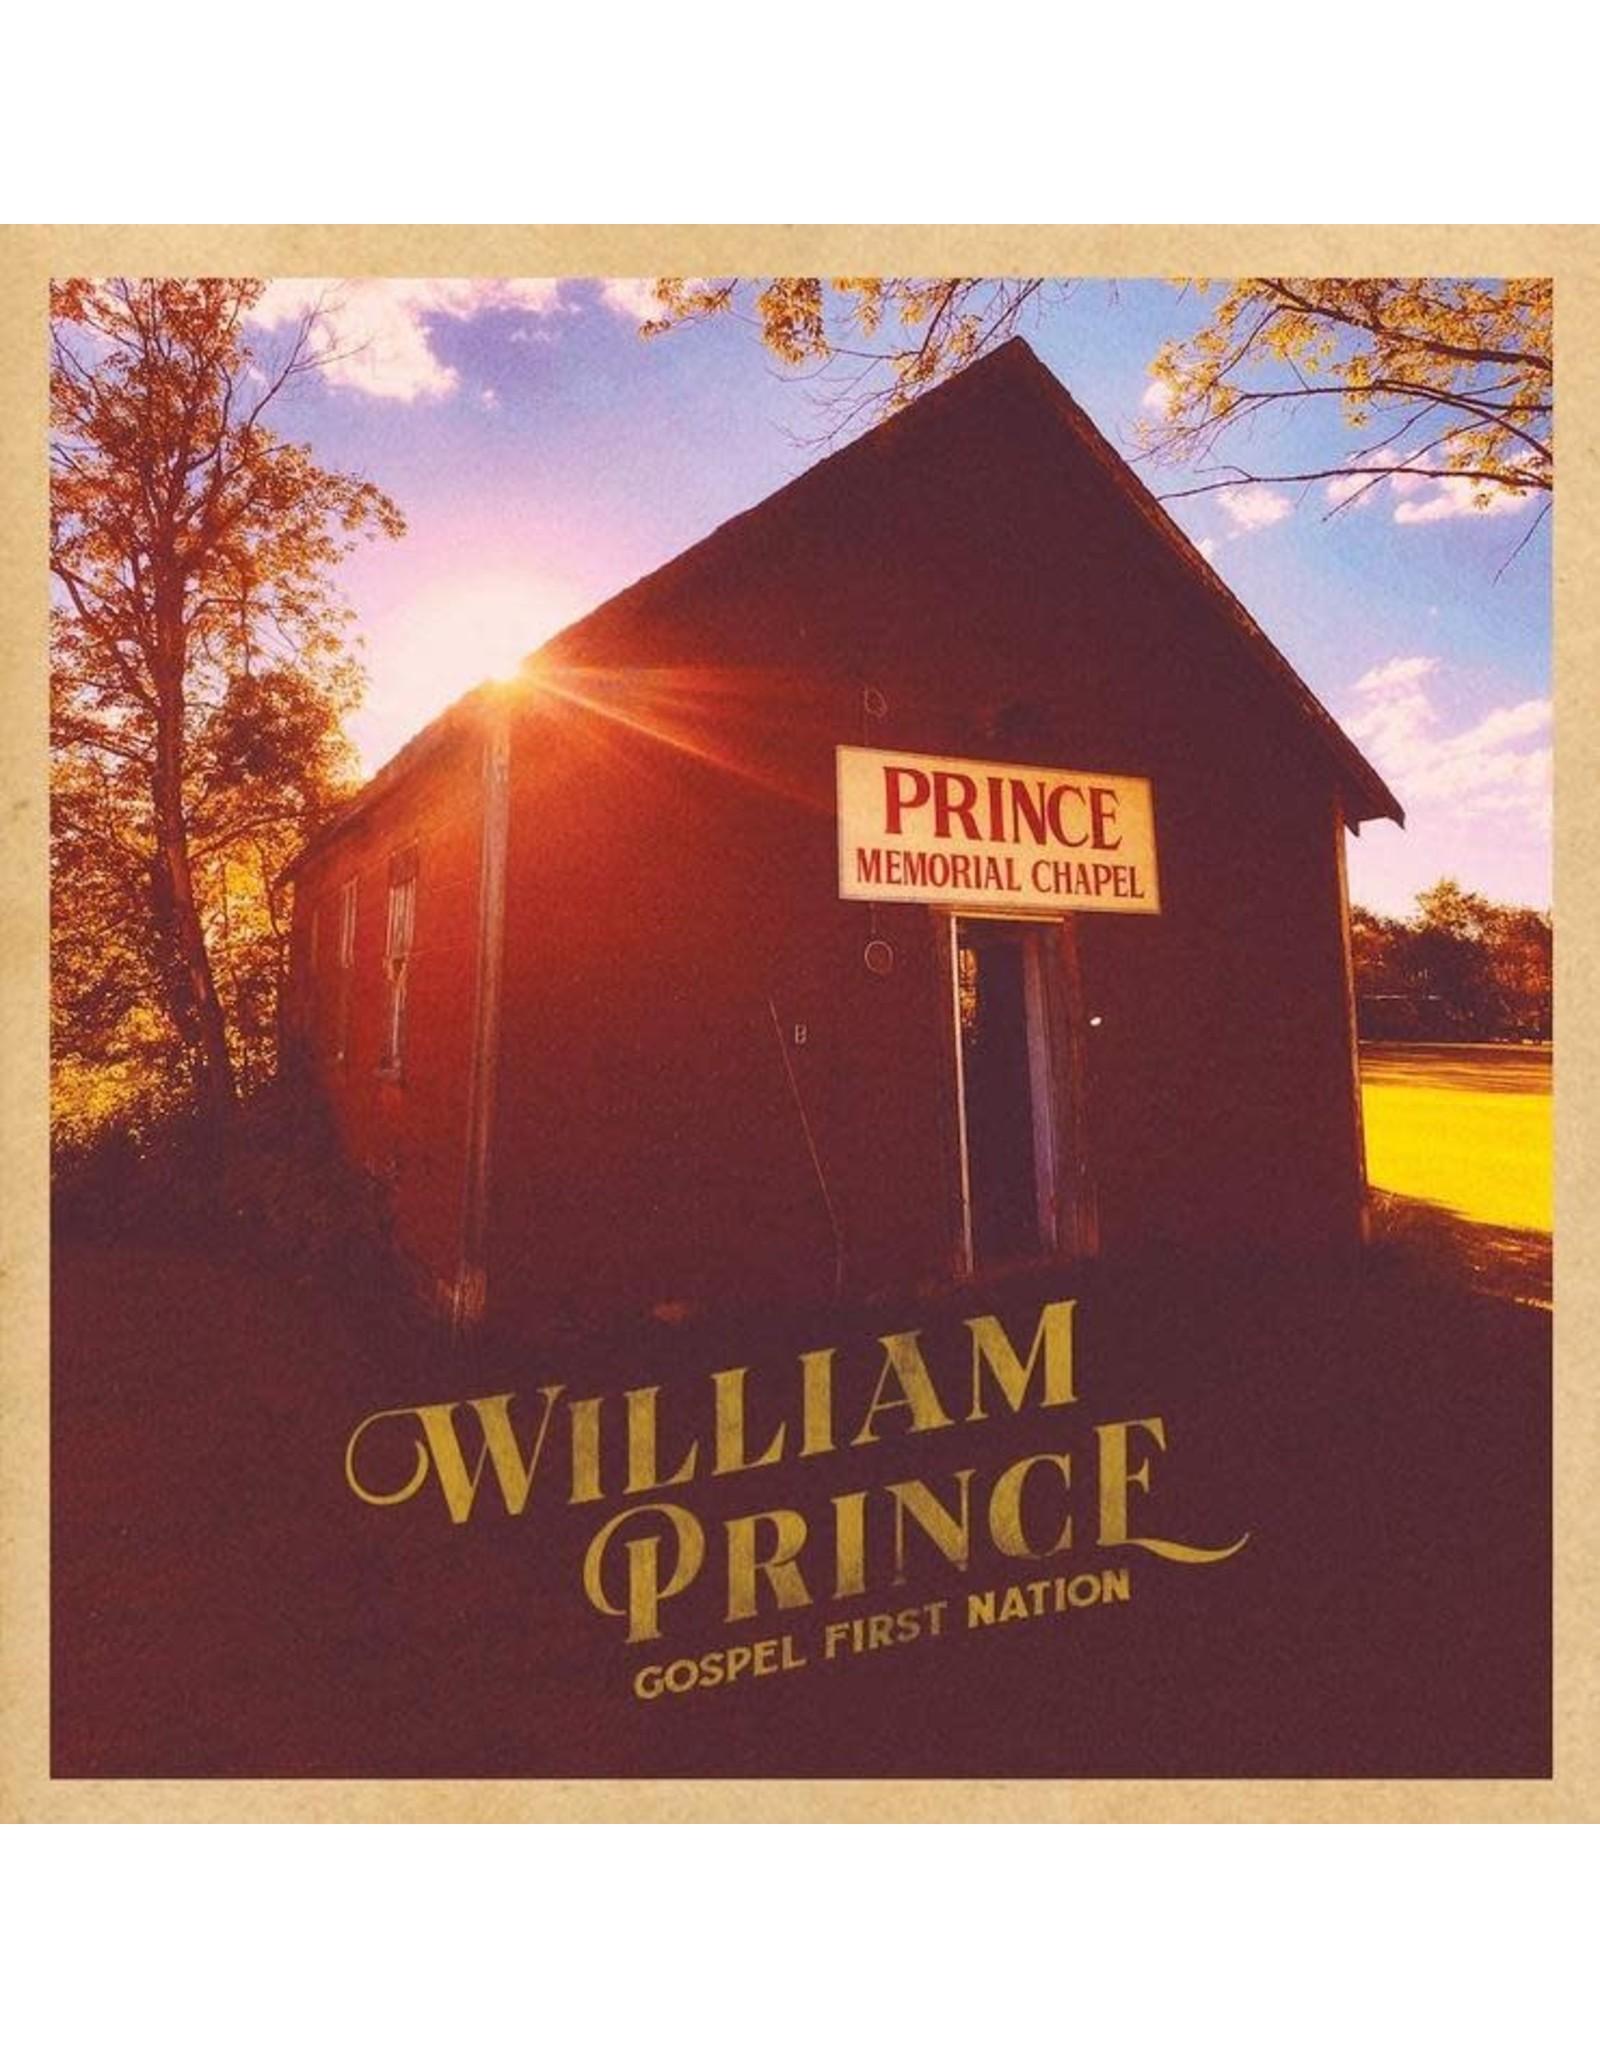 Prince, William - Gospel First Nation LP